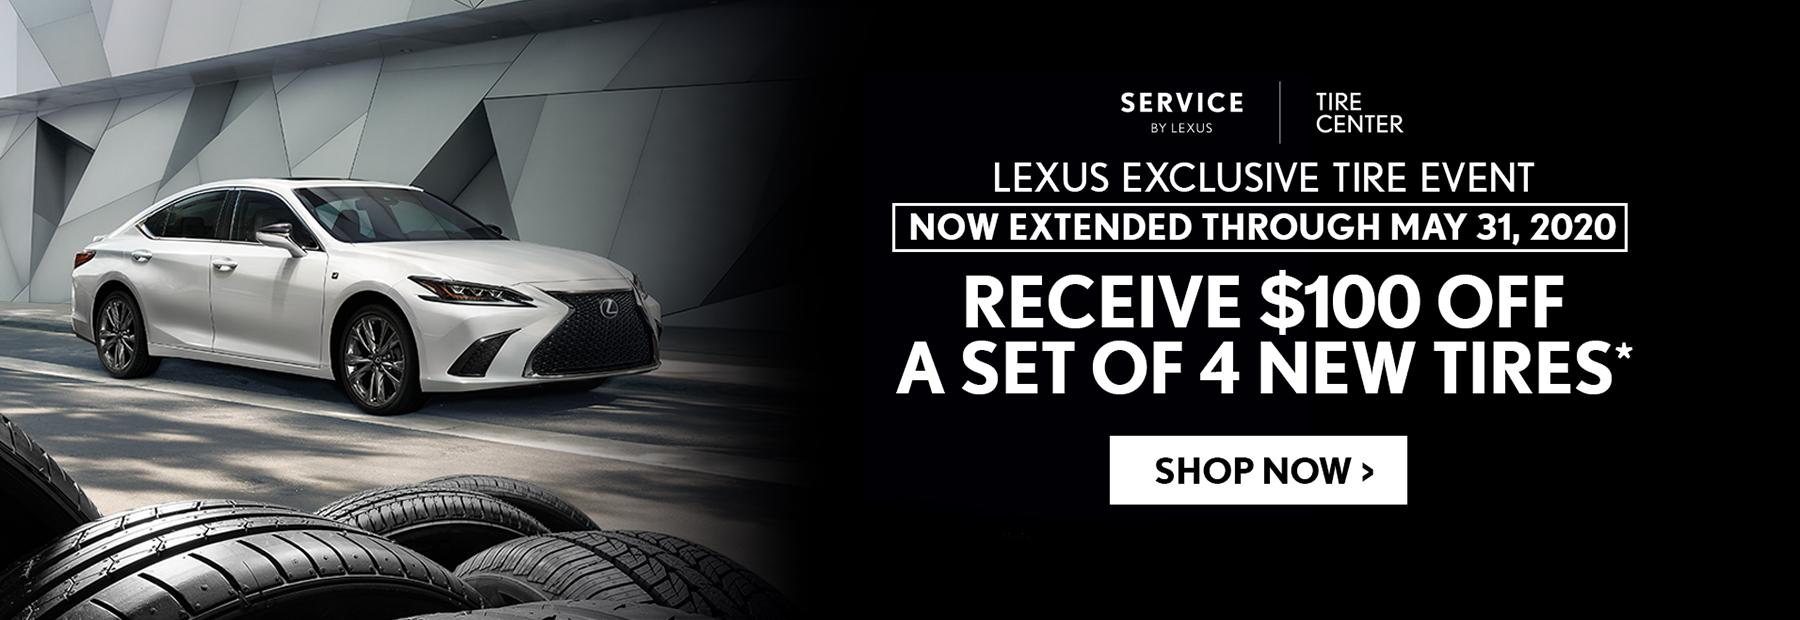 performance-lexus-tire-event-save-100-dollars